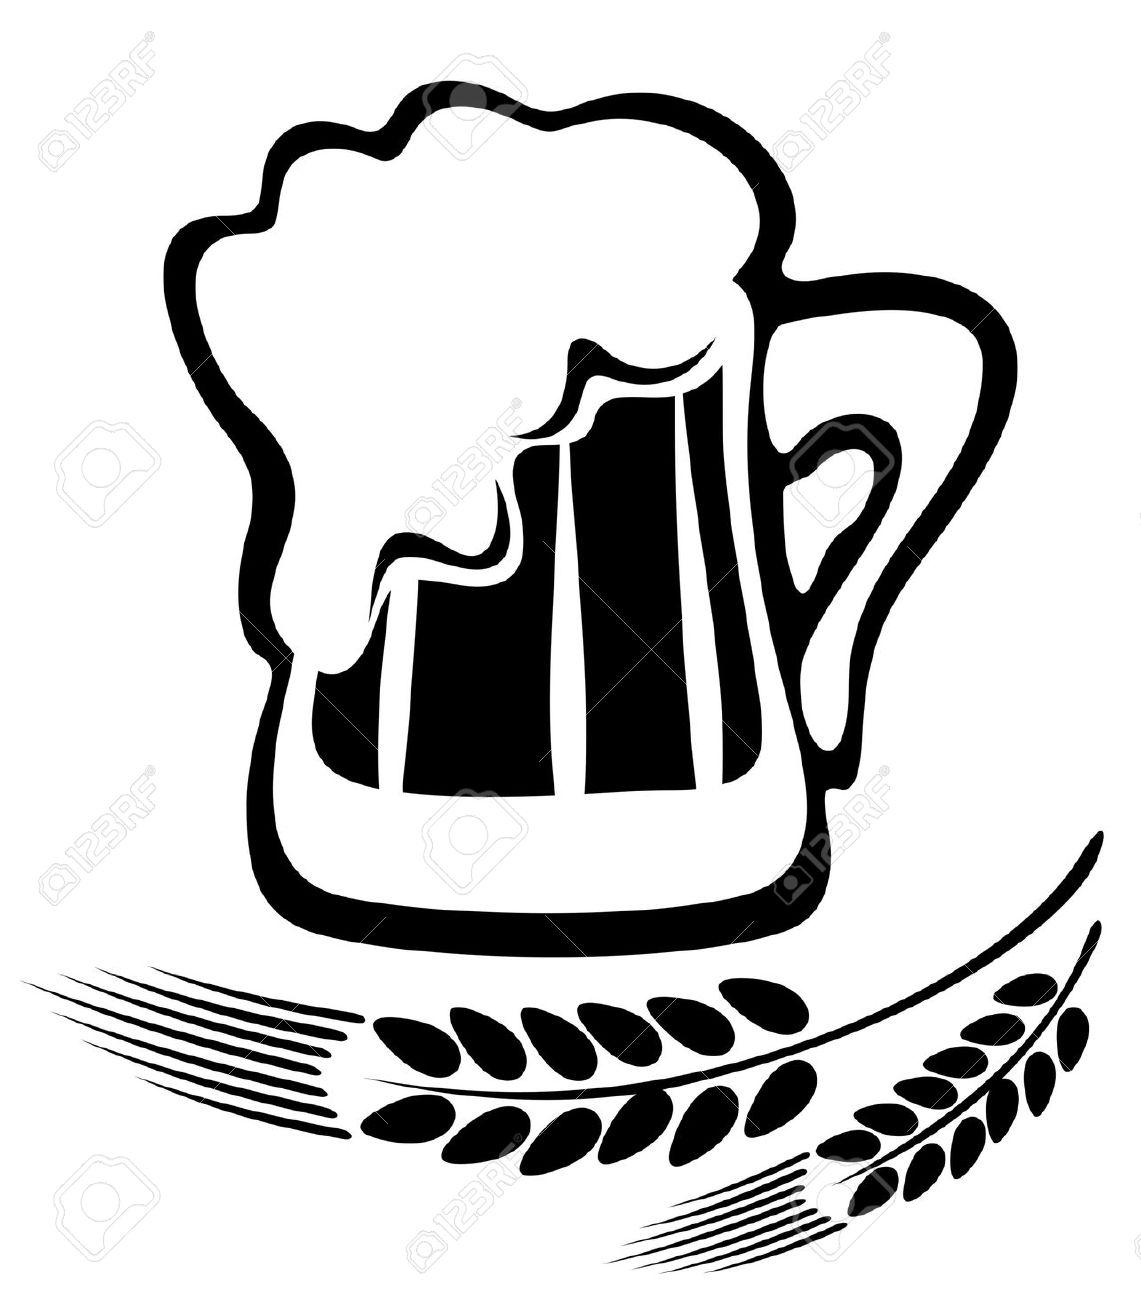 Beer Mug Image Clipart